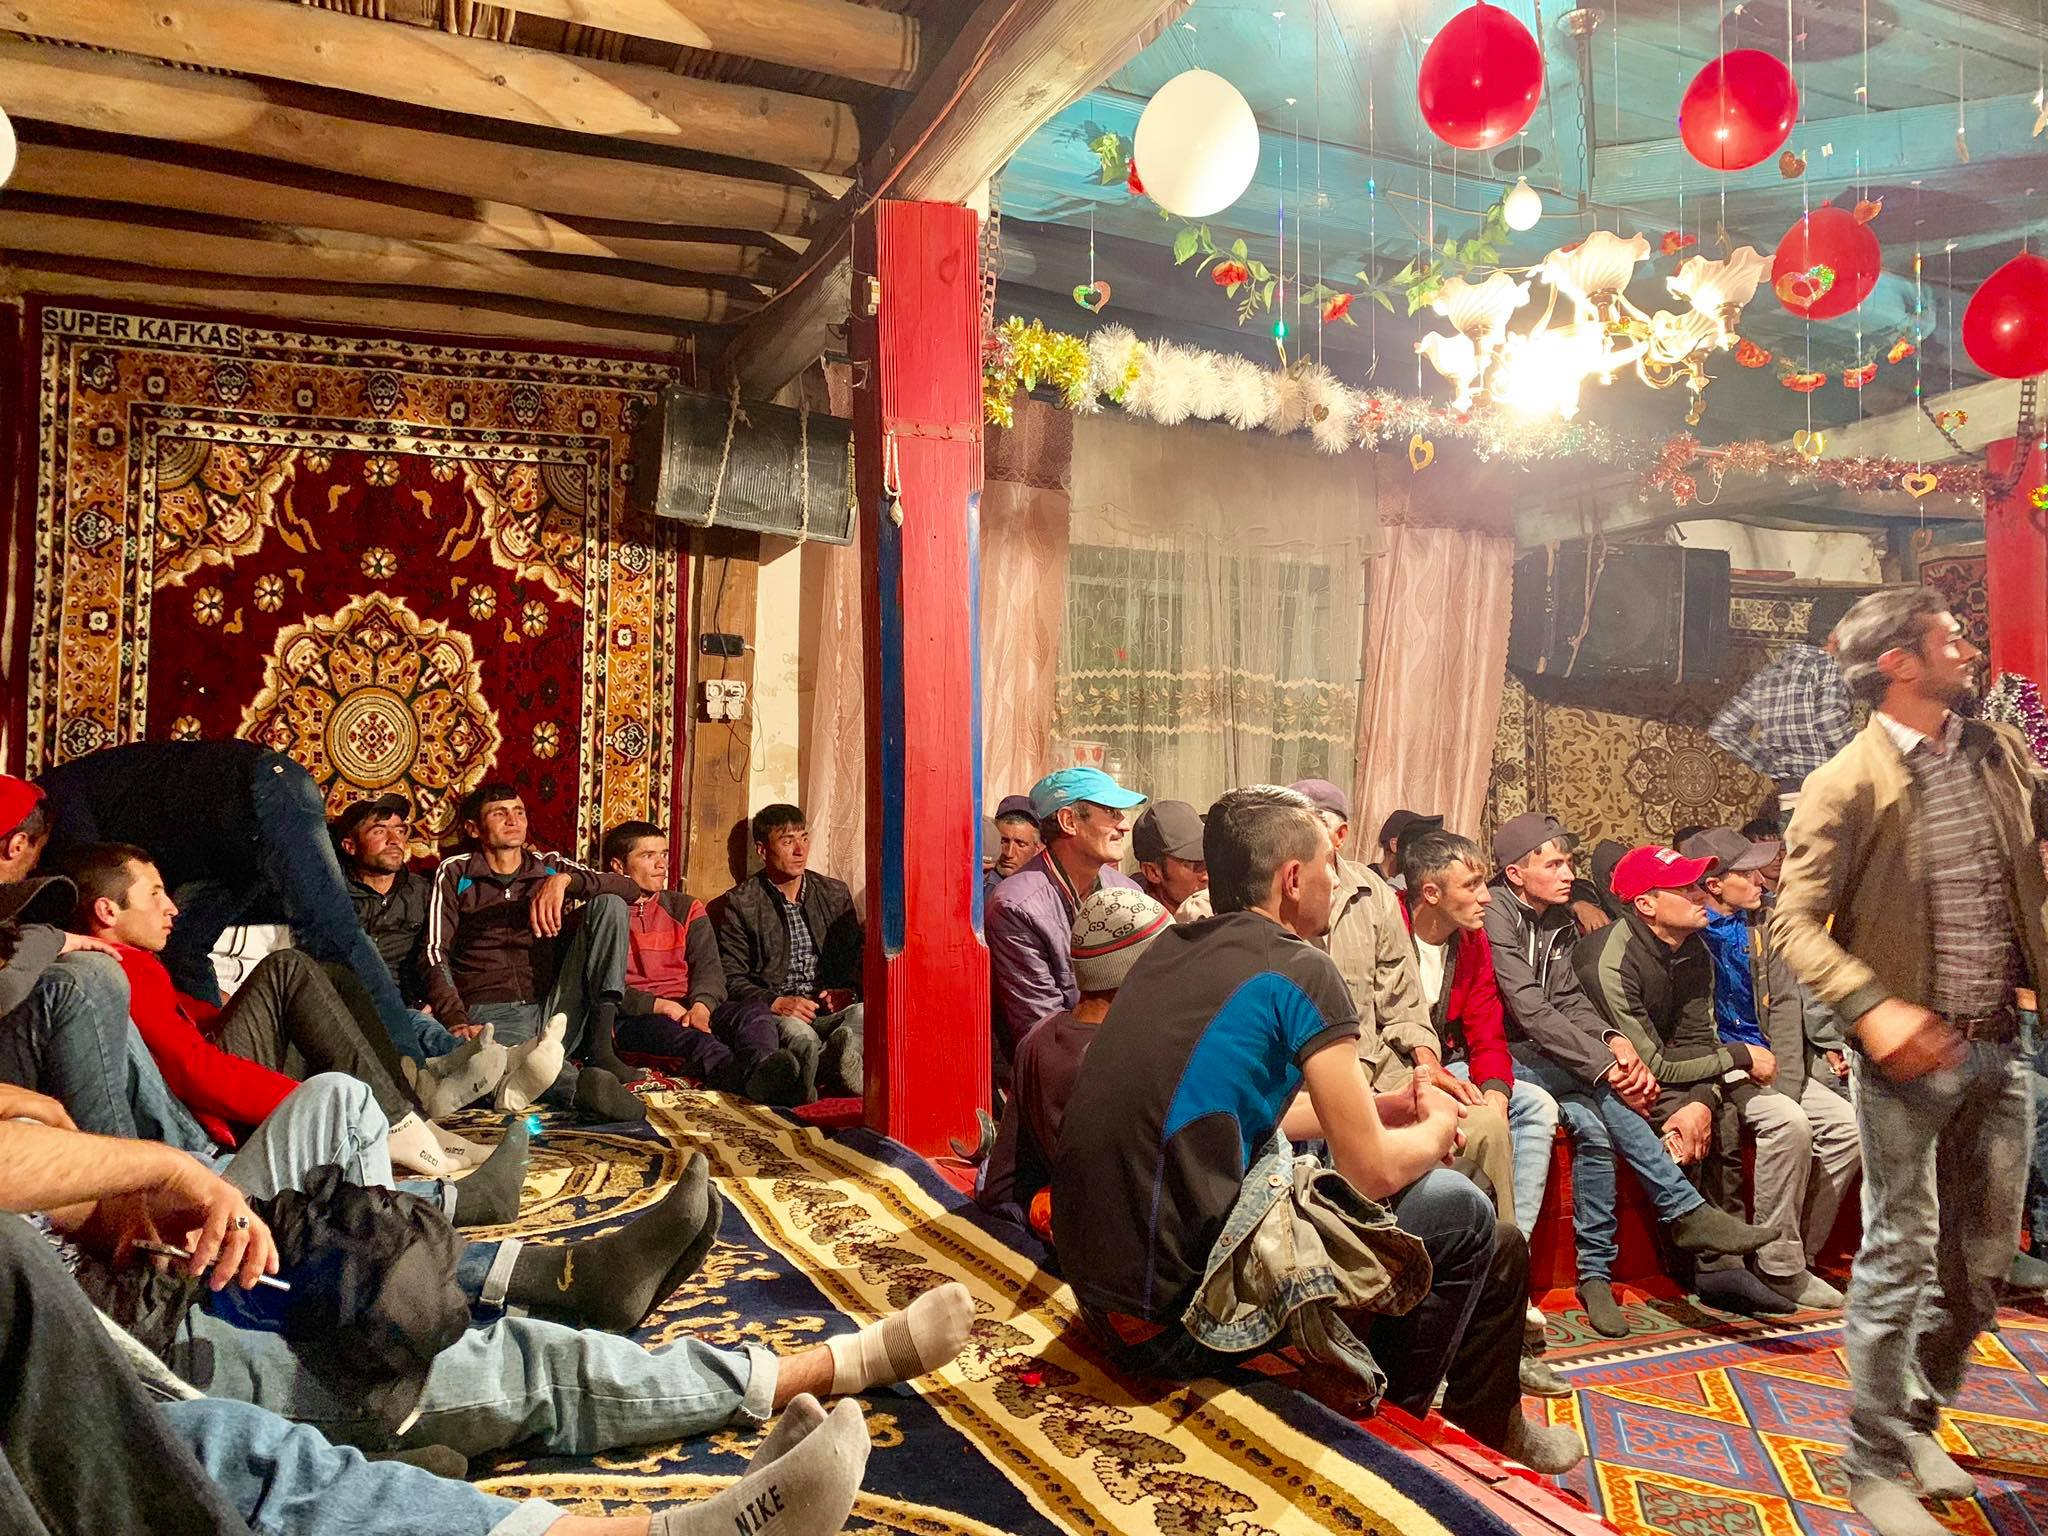 Kach Solo Travels in 2019 Experiencing a Traditional Wakhan Wedding in Tajikistan5.jpg